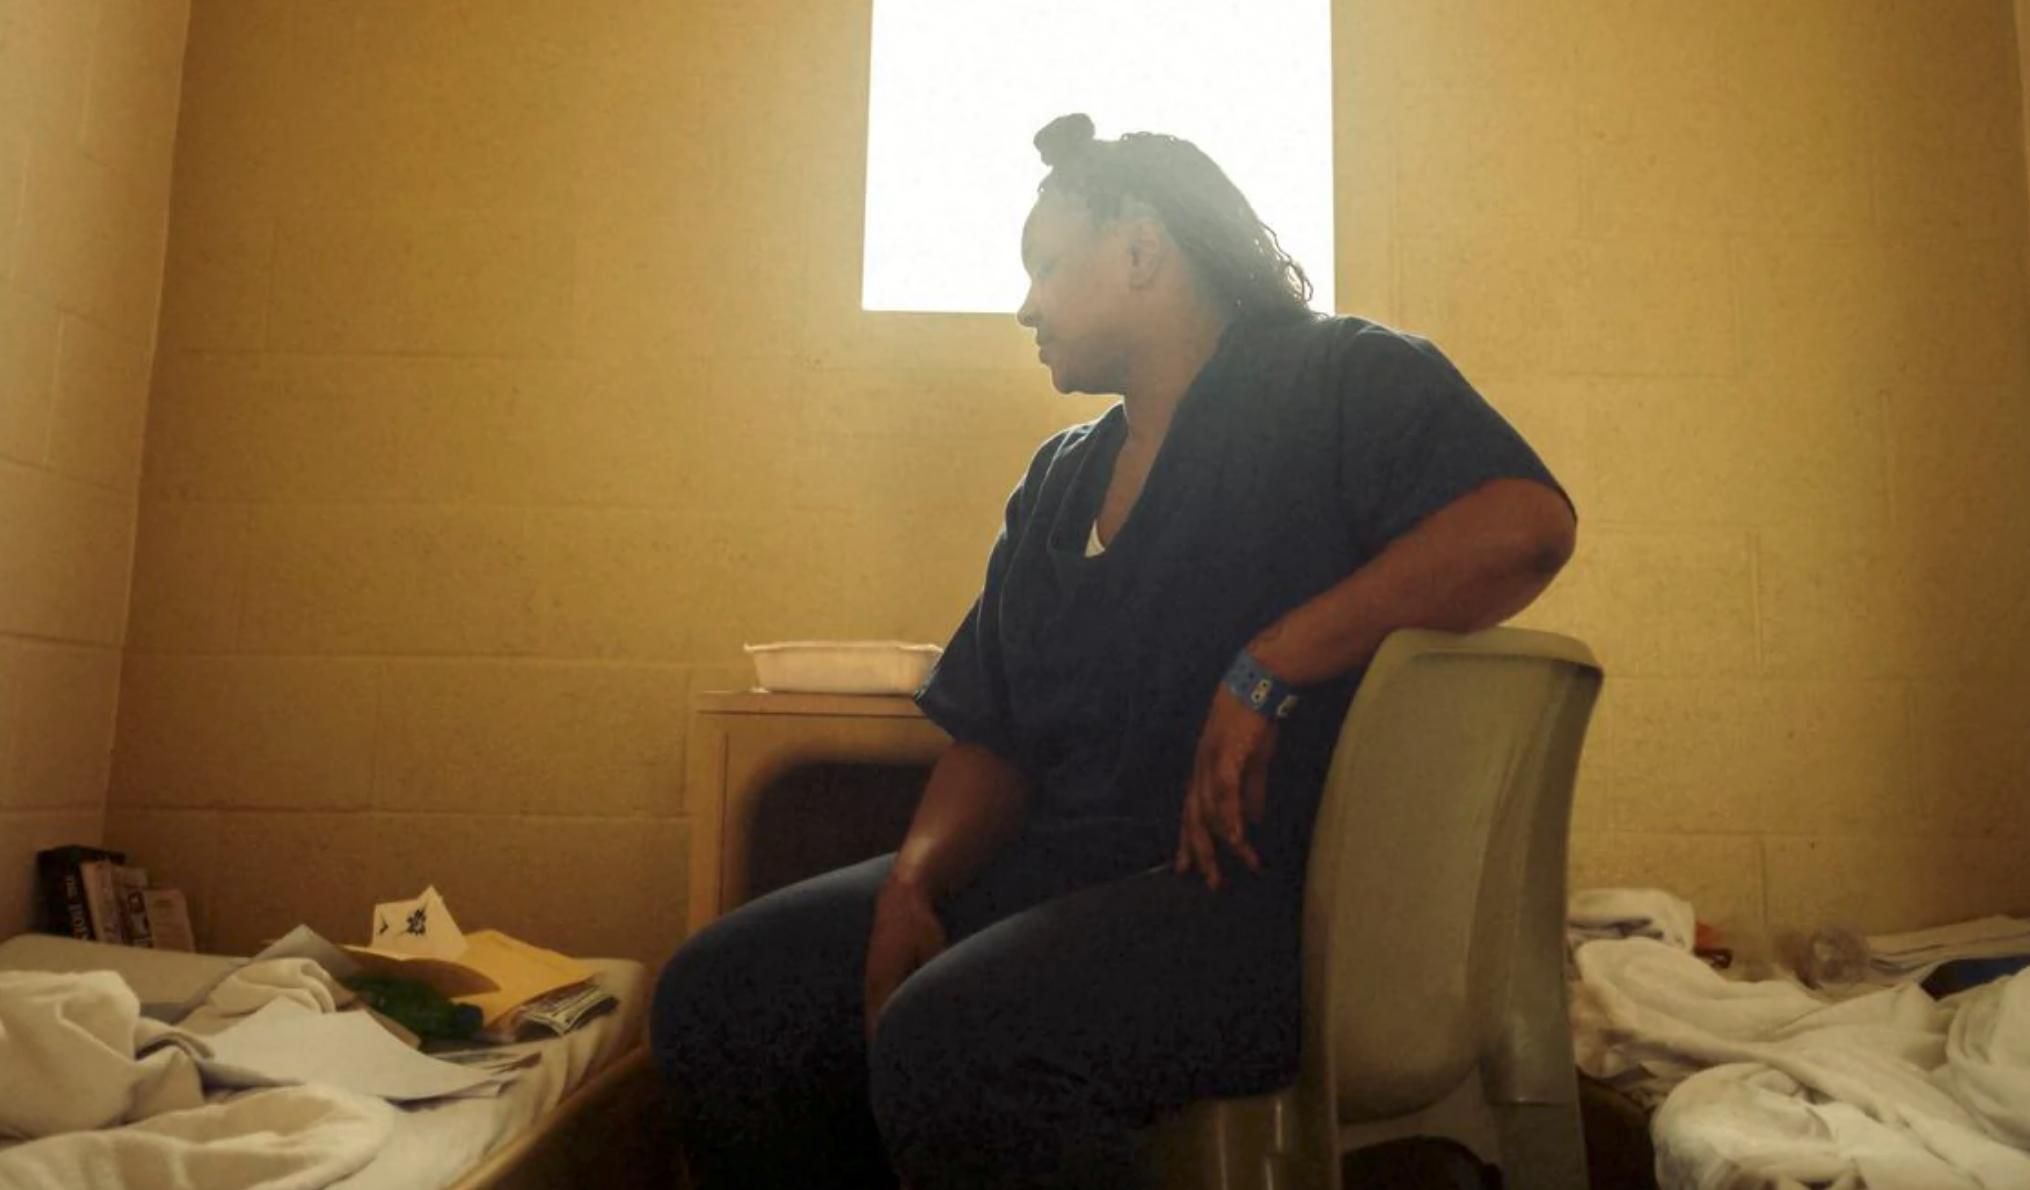 Can We Build a Better Women's Prison?